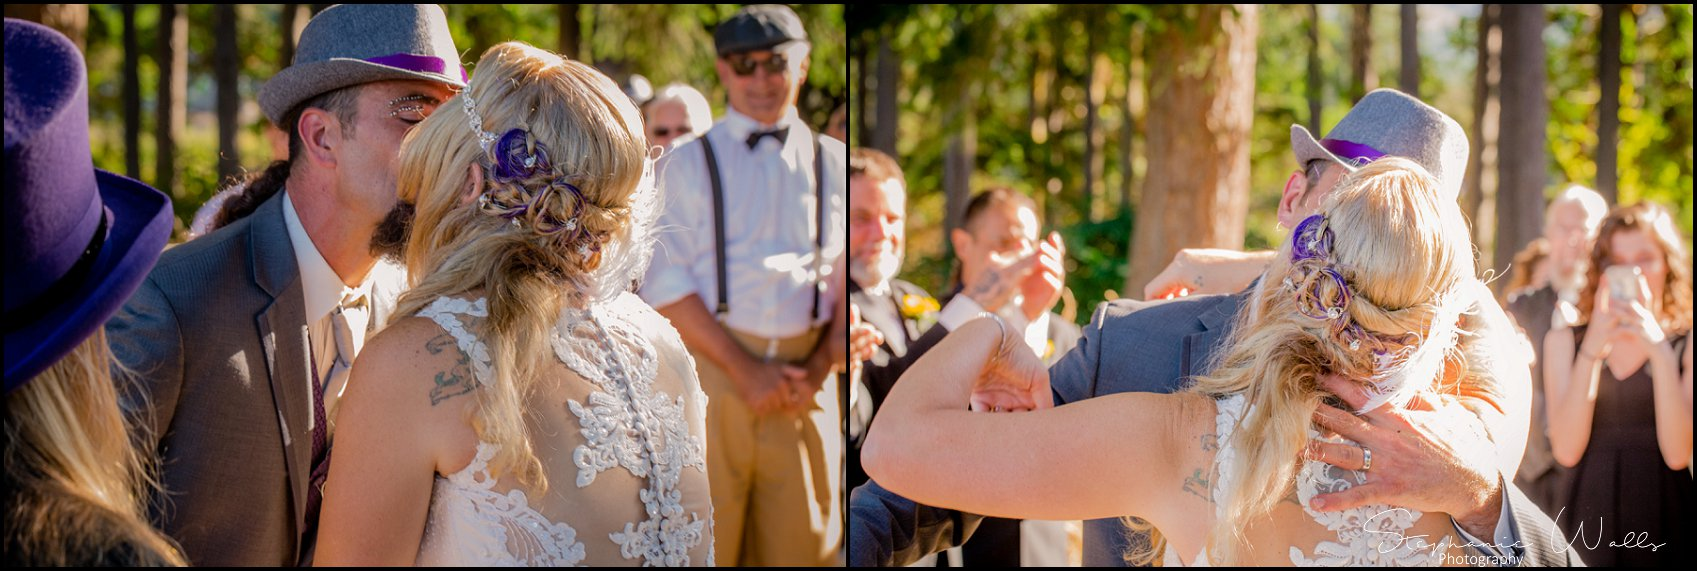 Everist Wedding 246 Patti & Bobbys | Troll Haven Castle & Bandy Farms | Sequim, Wa Wedding Photographer